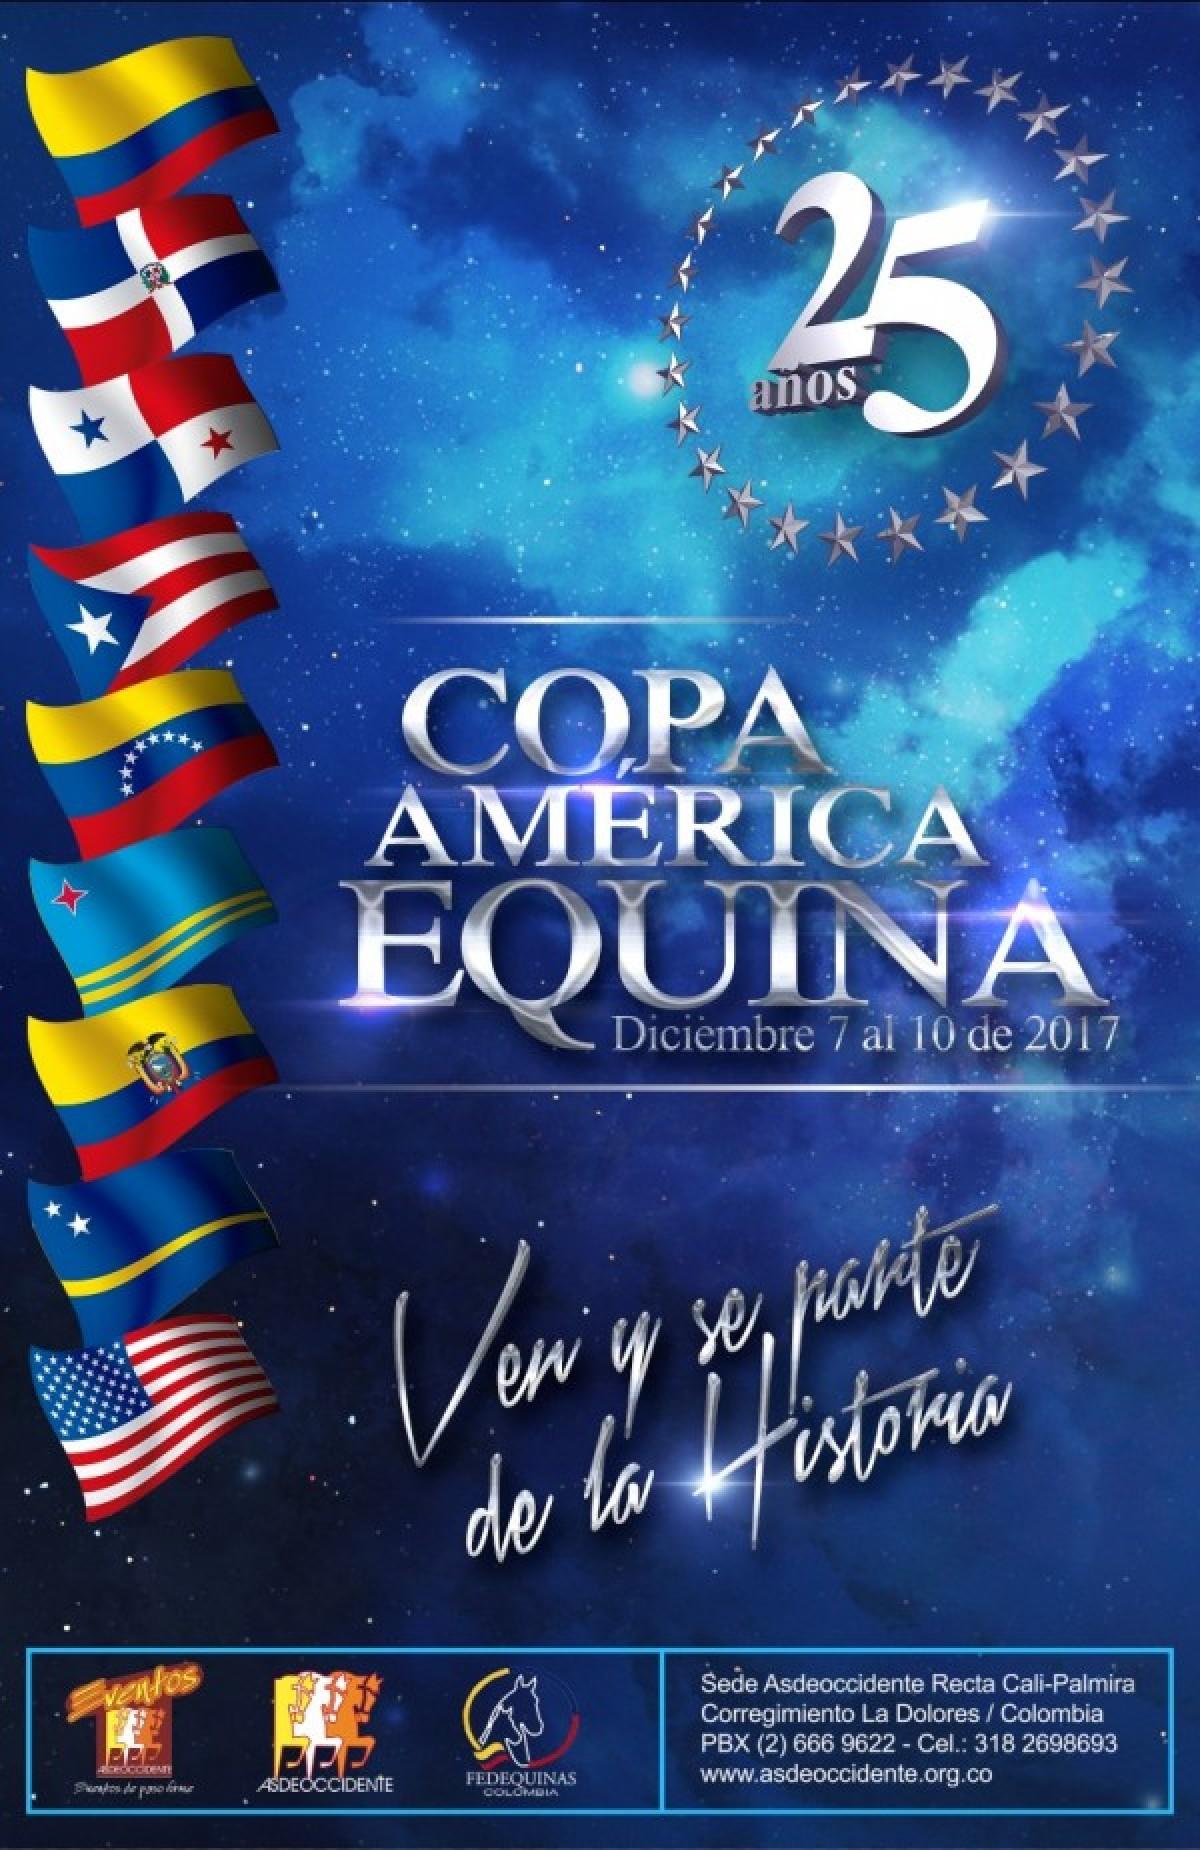 TRANSMISIÓN 25a Copa América Equina Del 7 Al 10 De Diciembre